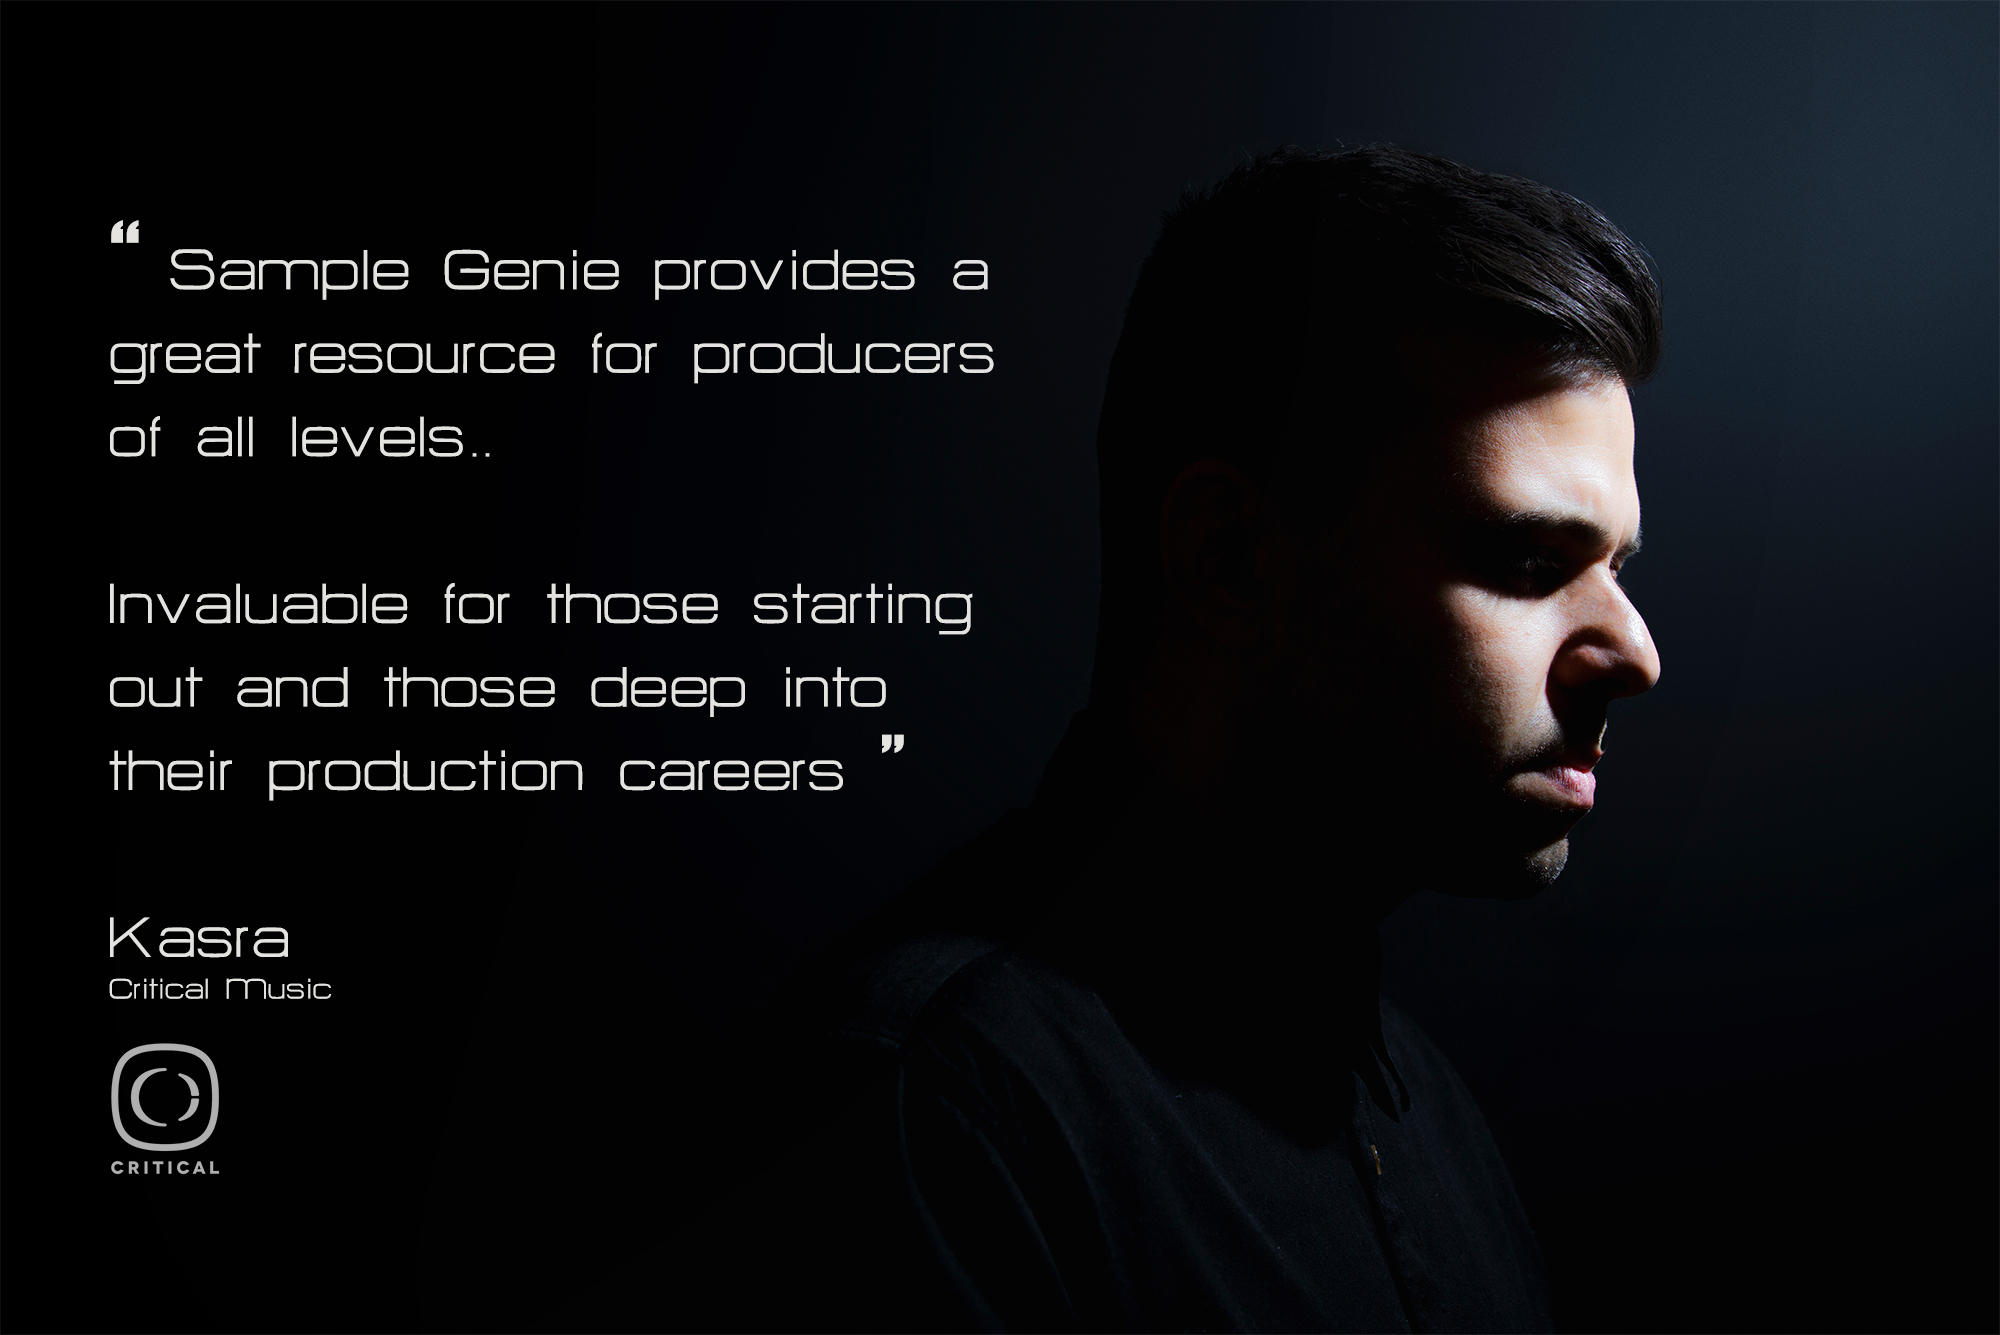 https://sample-genie.com/wp-content/uploads/2015/06/KASRAQUOTE.jpg